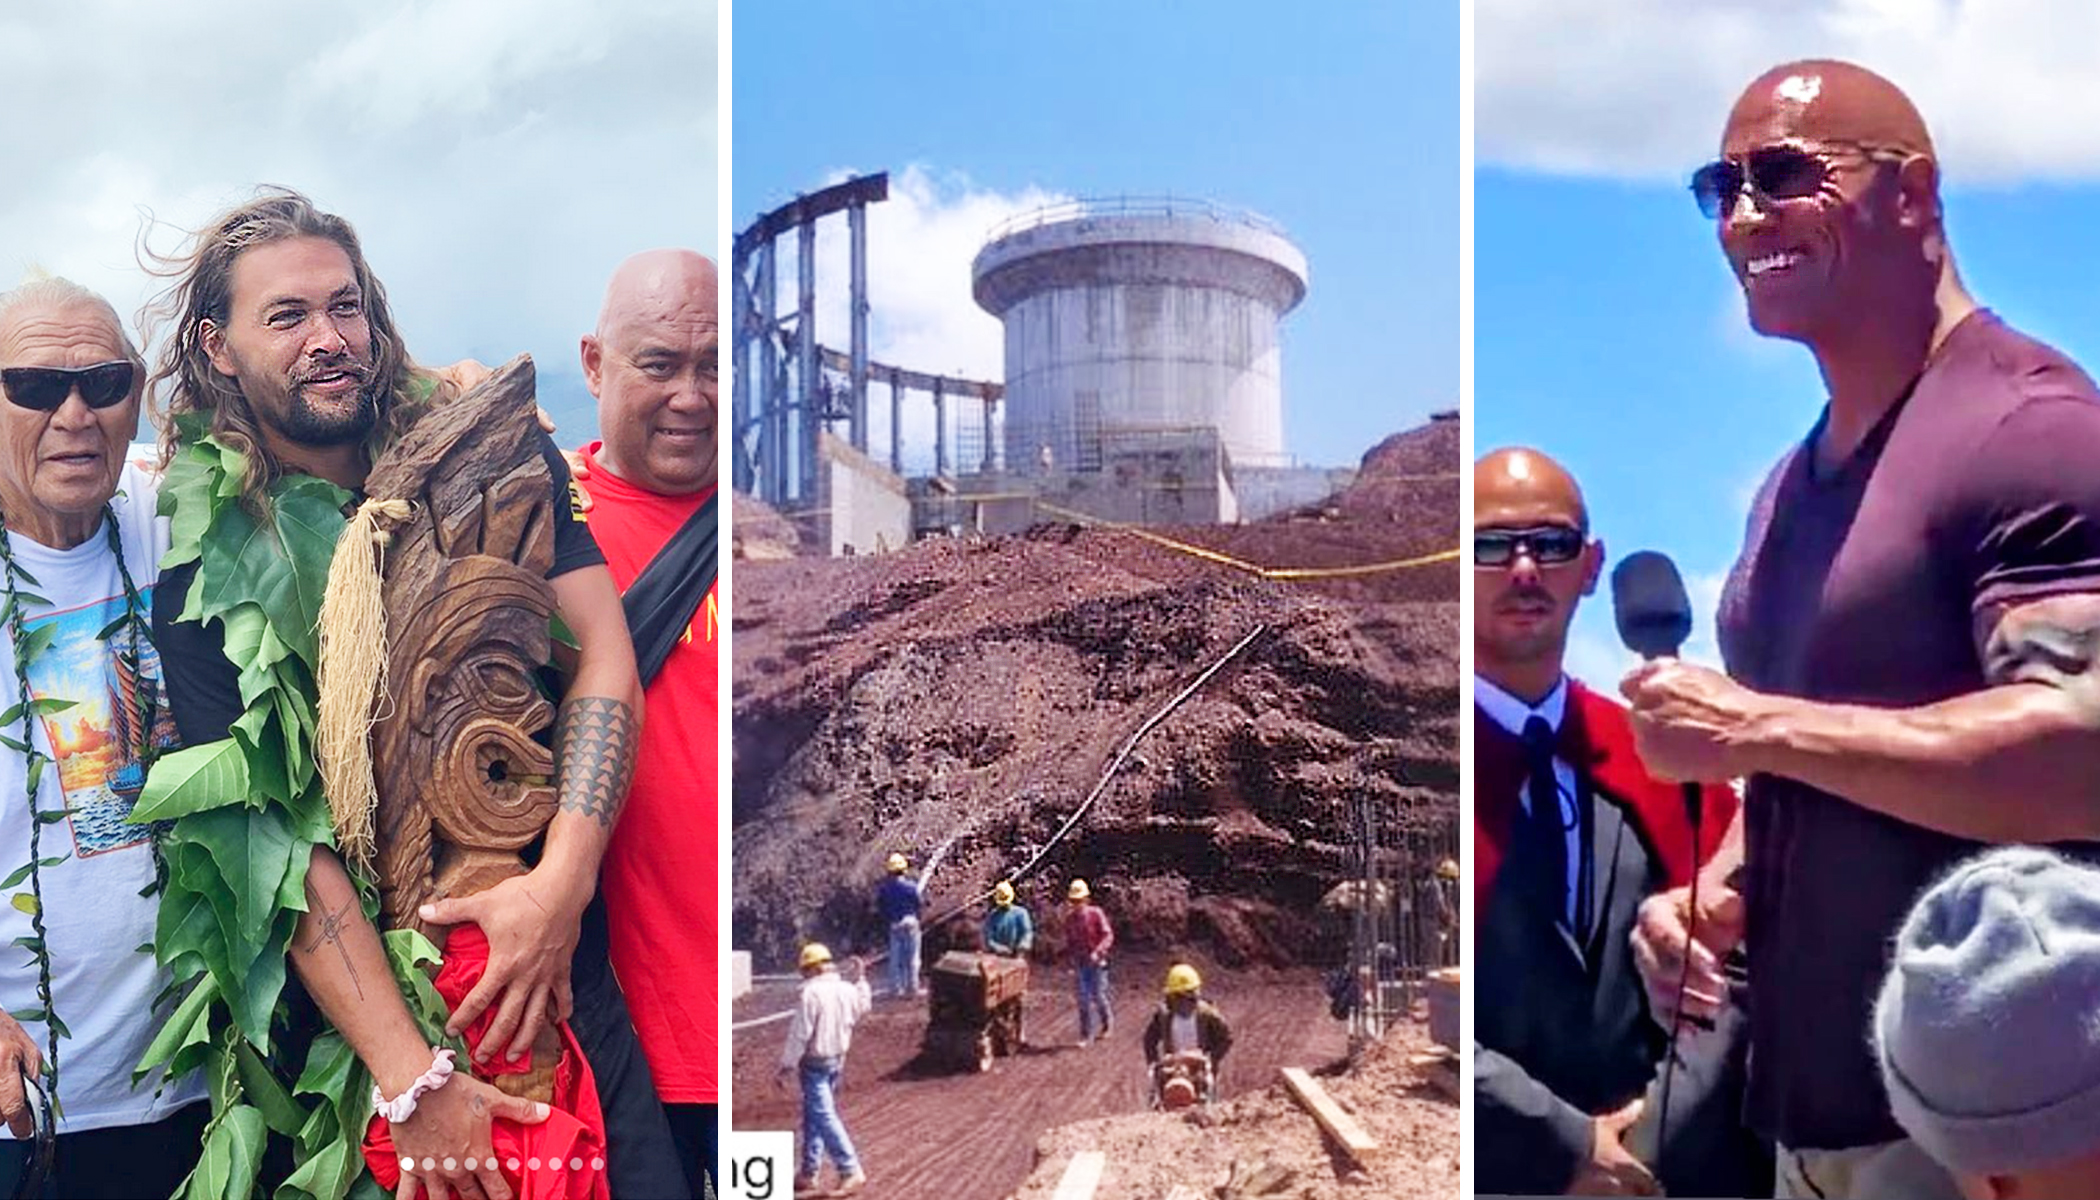 Jason Momoa and Dwayne Johnson Oppose New 'Thirty Meter Telescope' on Sacred Hawaiian Mountain